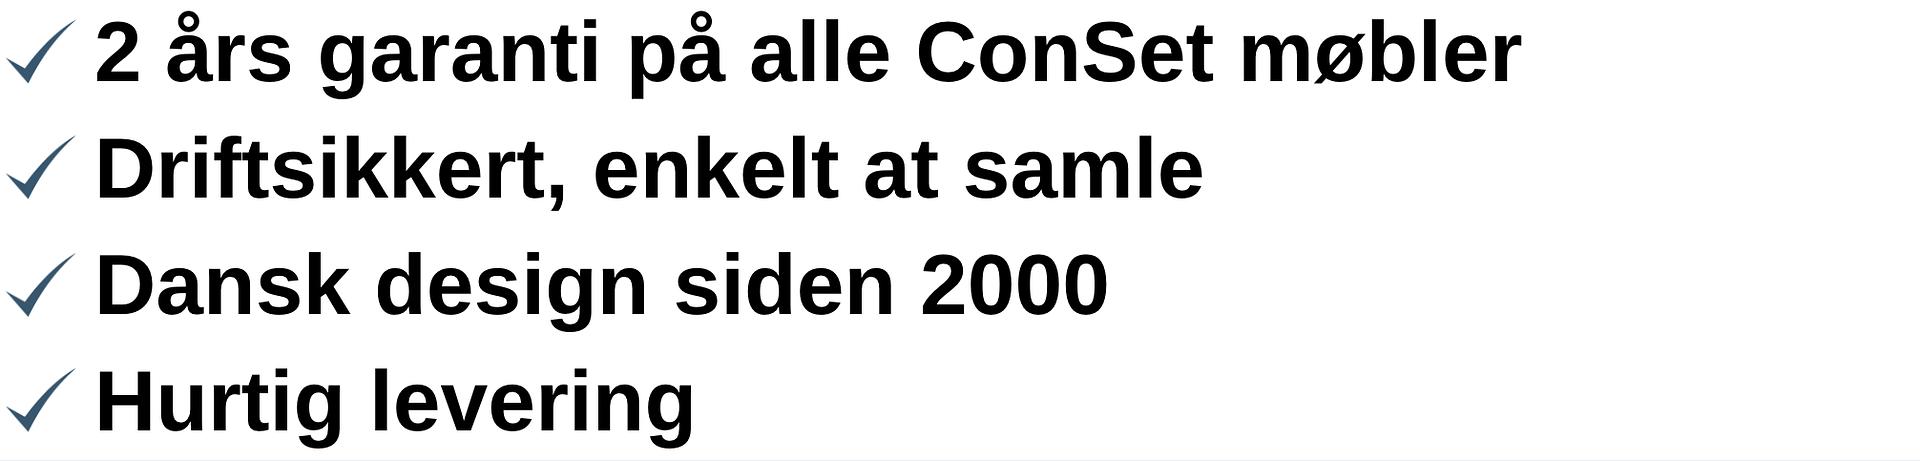 Conset logotekst